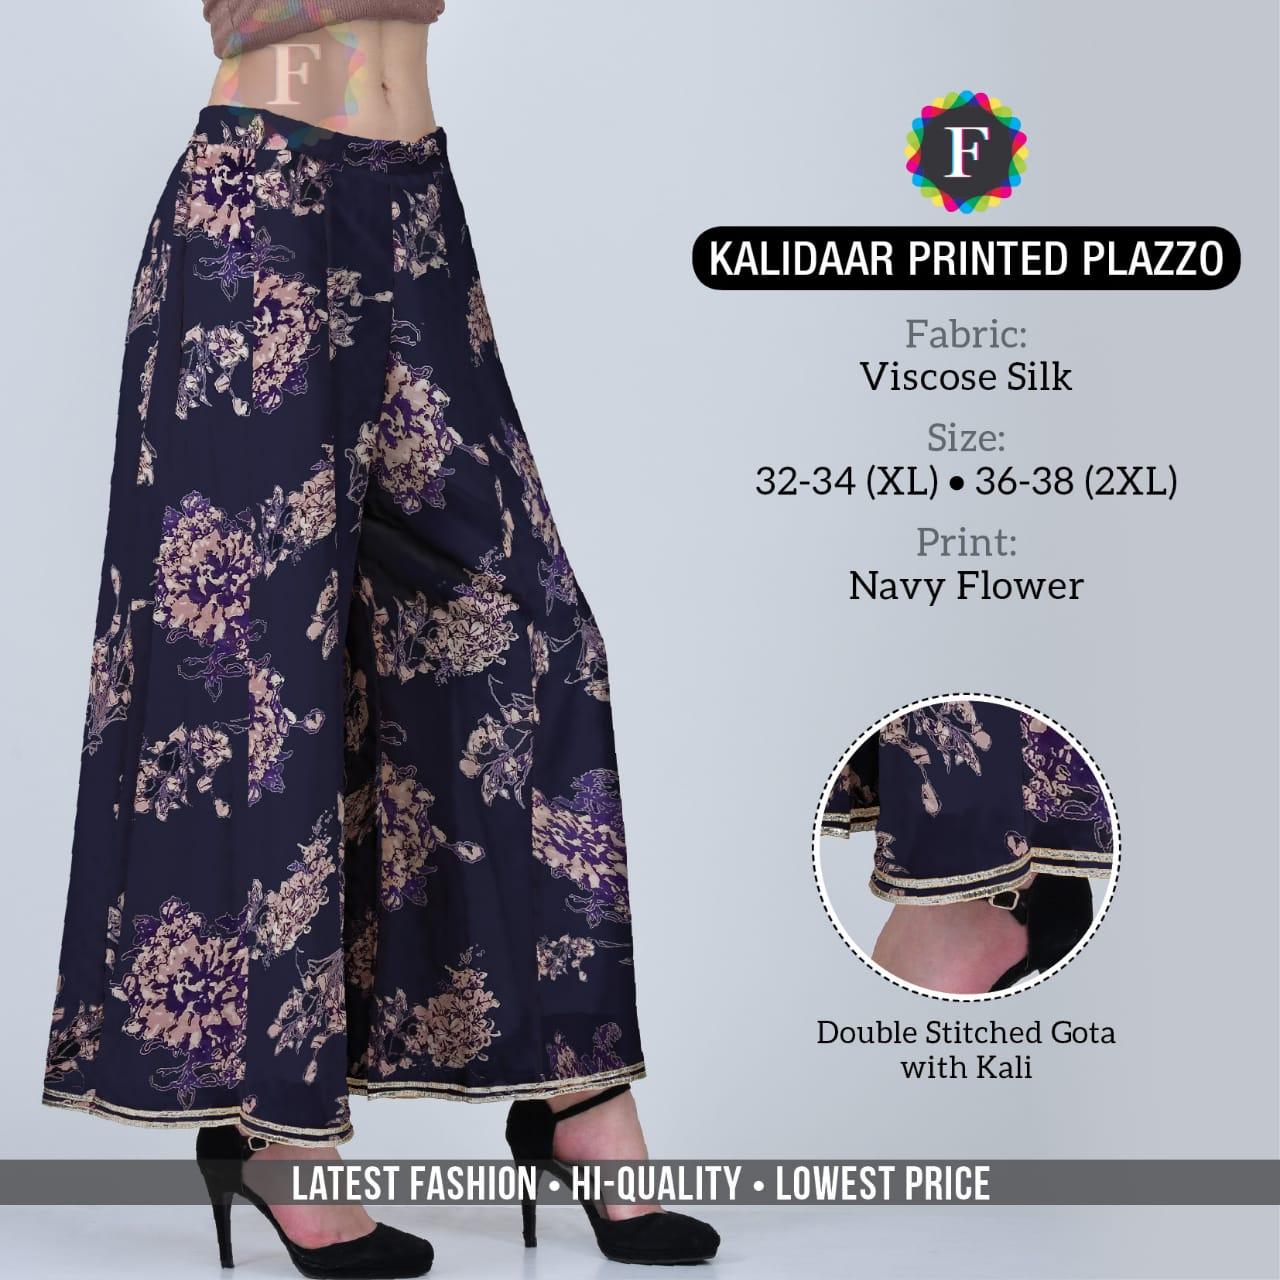 Kalidaar Printed Palazzo Ladies Bottom Wear Plazzo Clothing Store